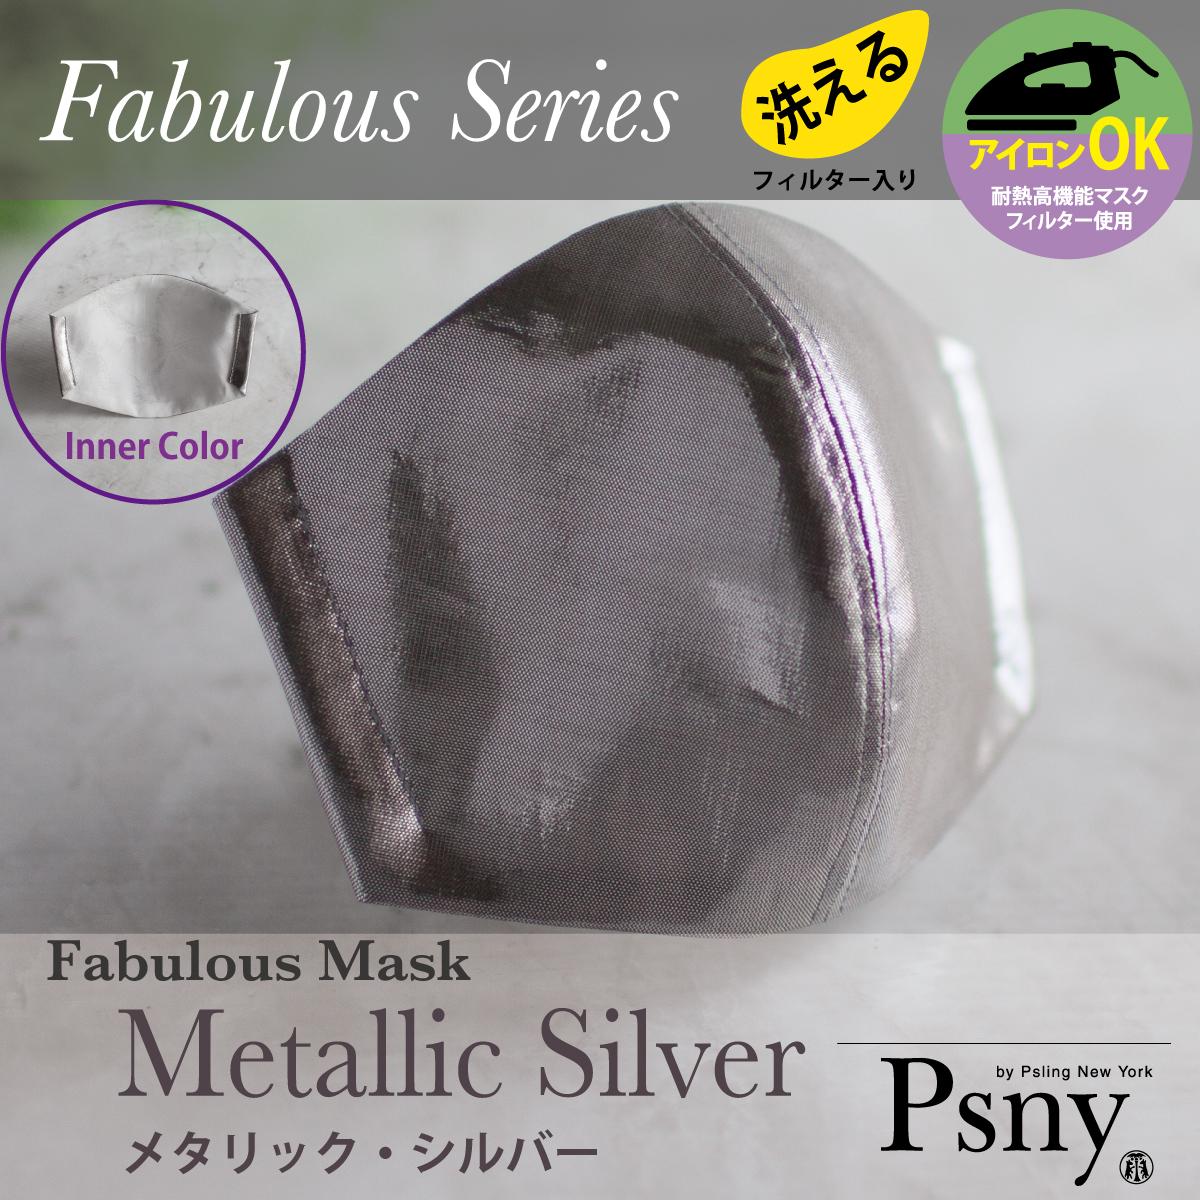 PSNY ファビュラス・シルバー・オーガンジー 花粉 黄砂 洗えるフィルター入り 立体 マスク 大人用 送料無料